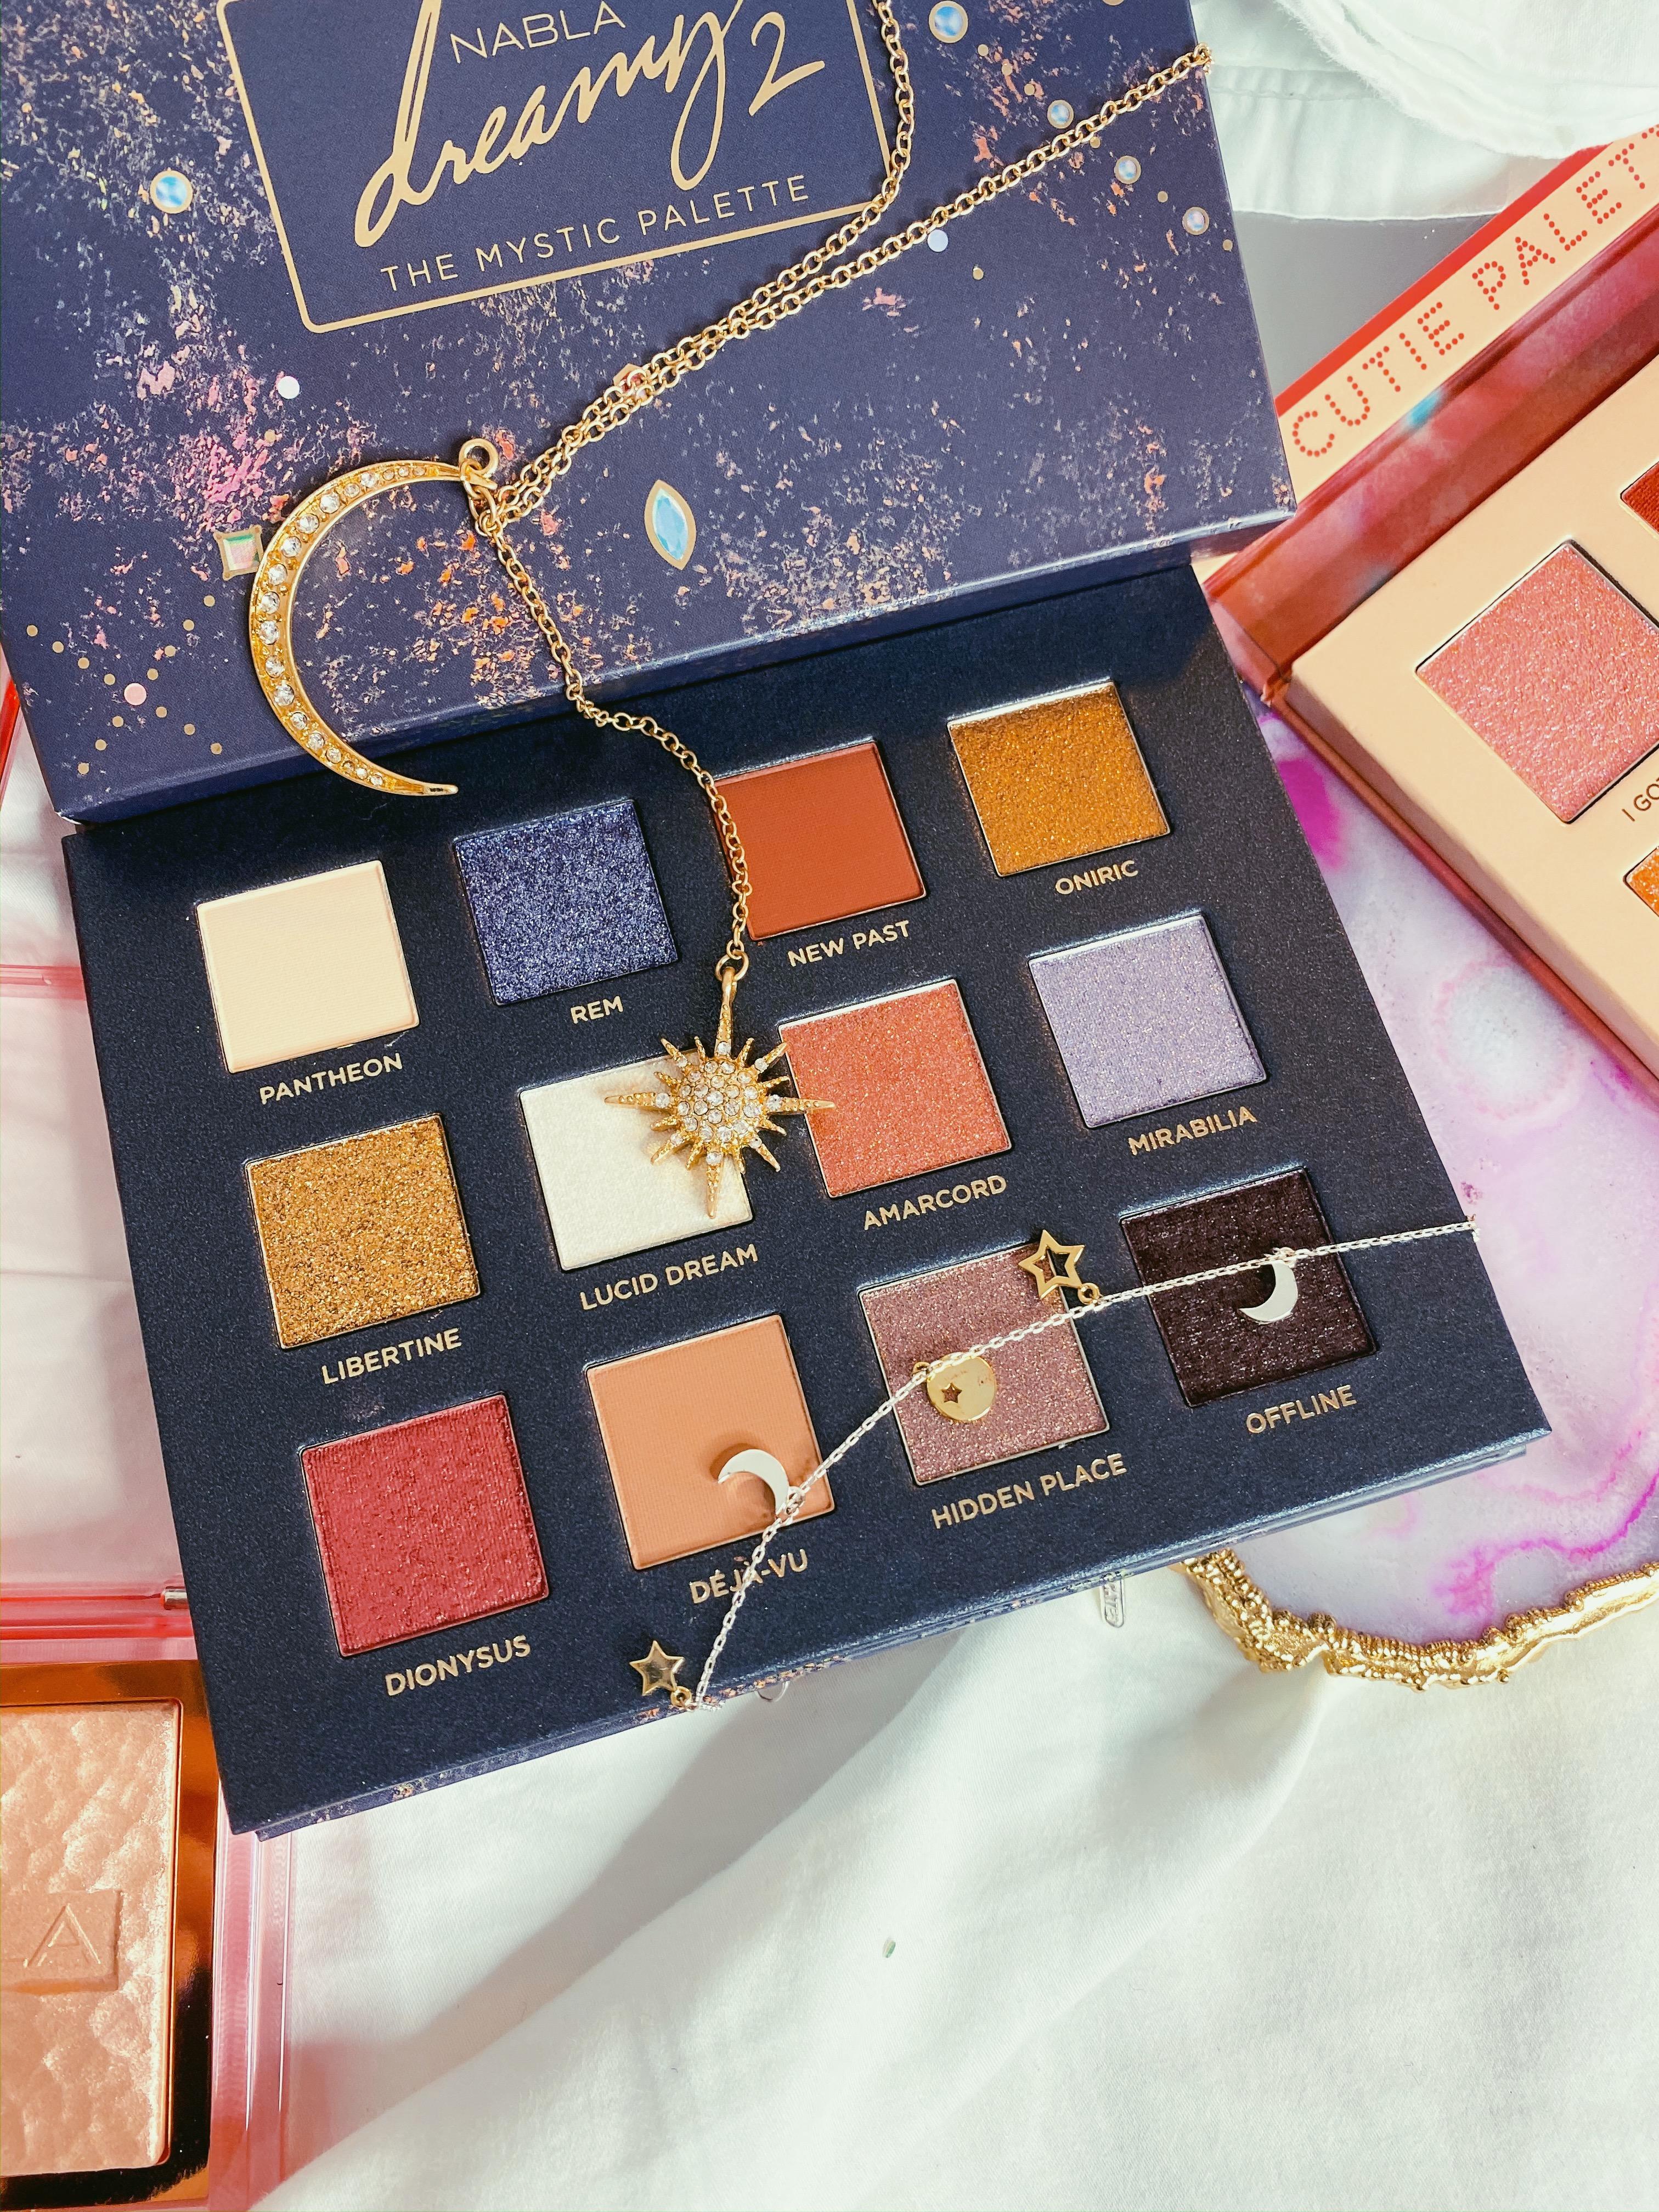 NABLA Dreamy 2 Palette Review | NABLA Dreamy 2 Palette Swatches | Italian Indie Beauty